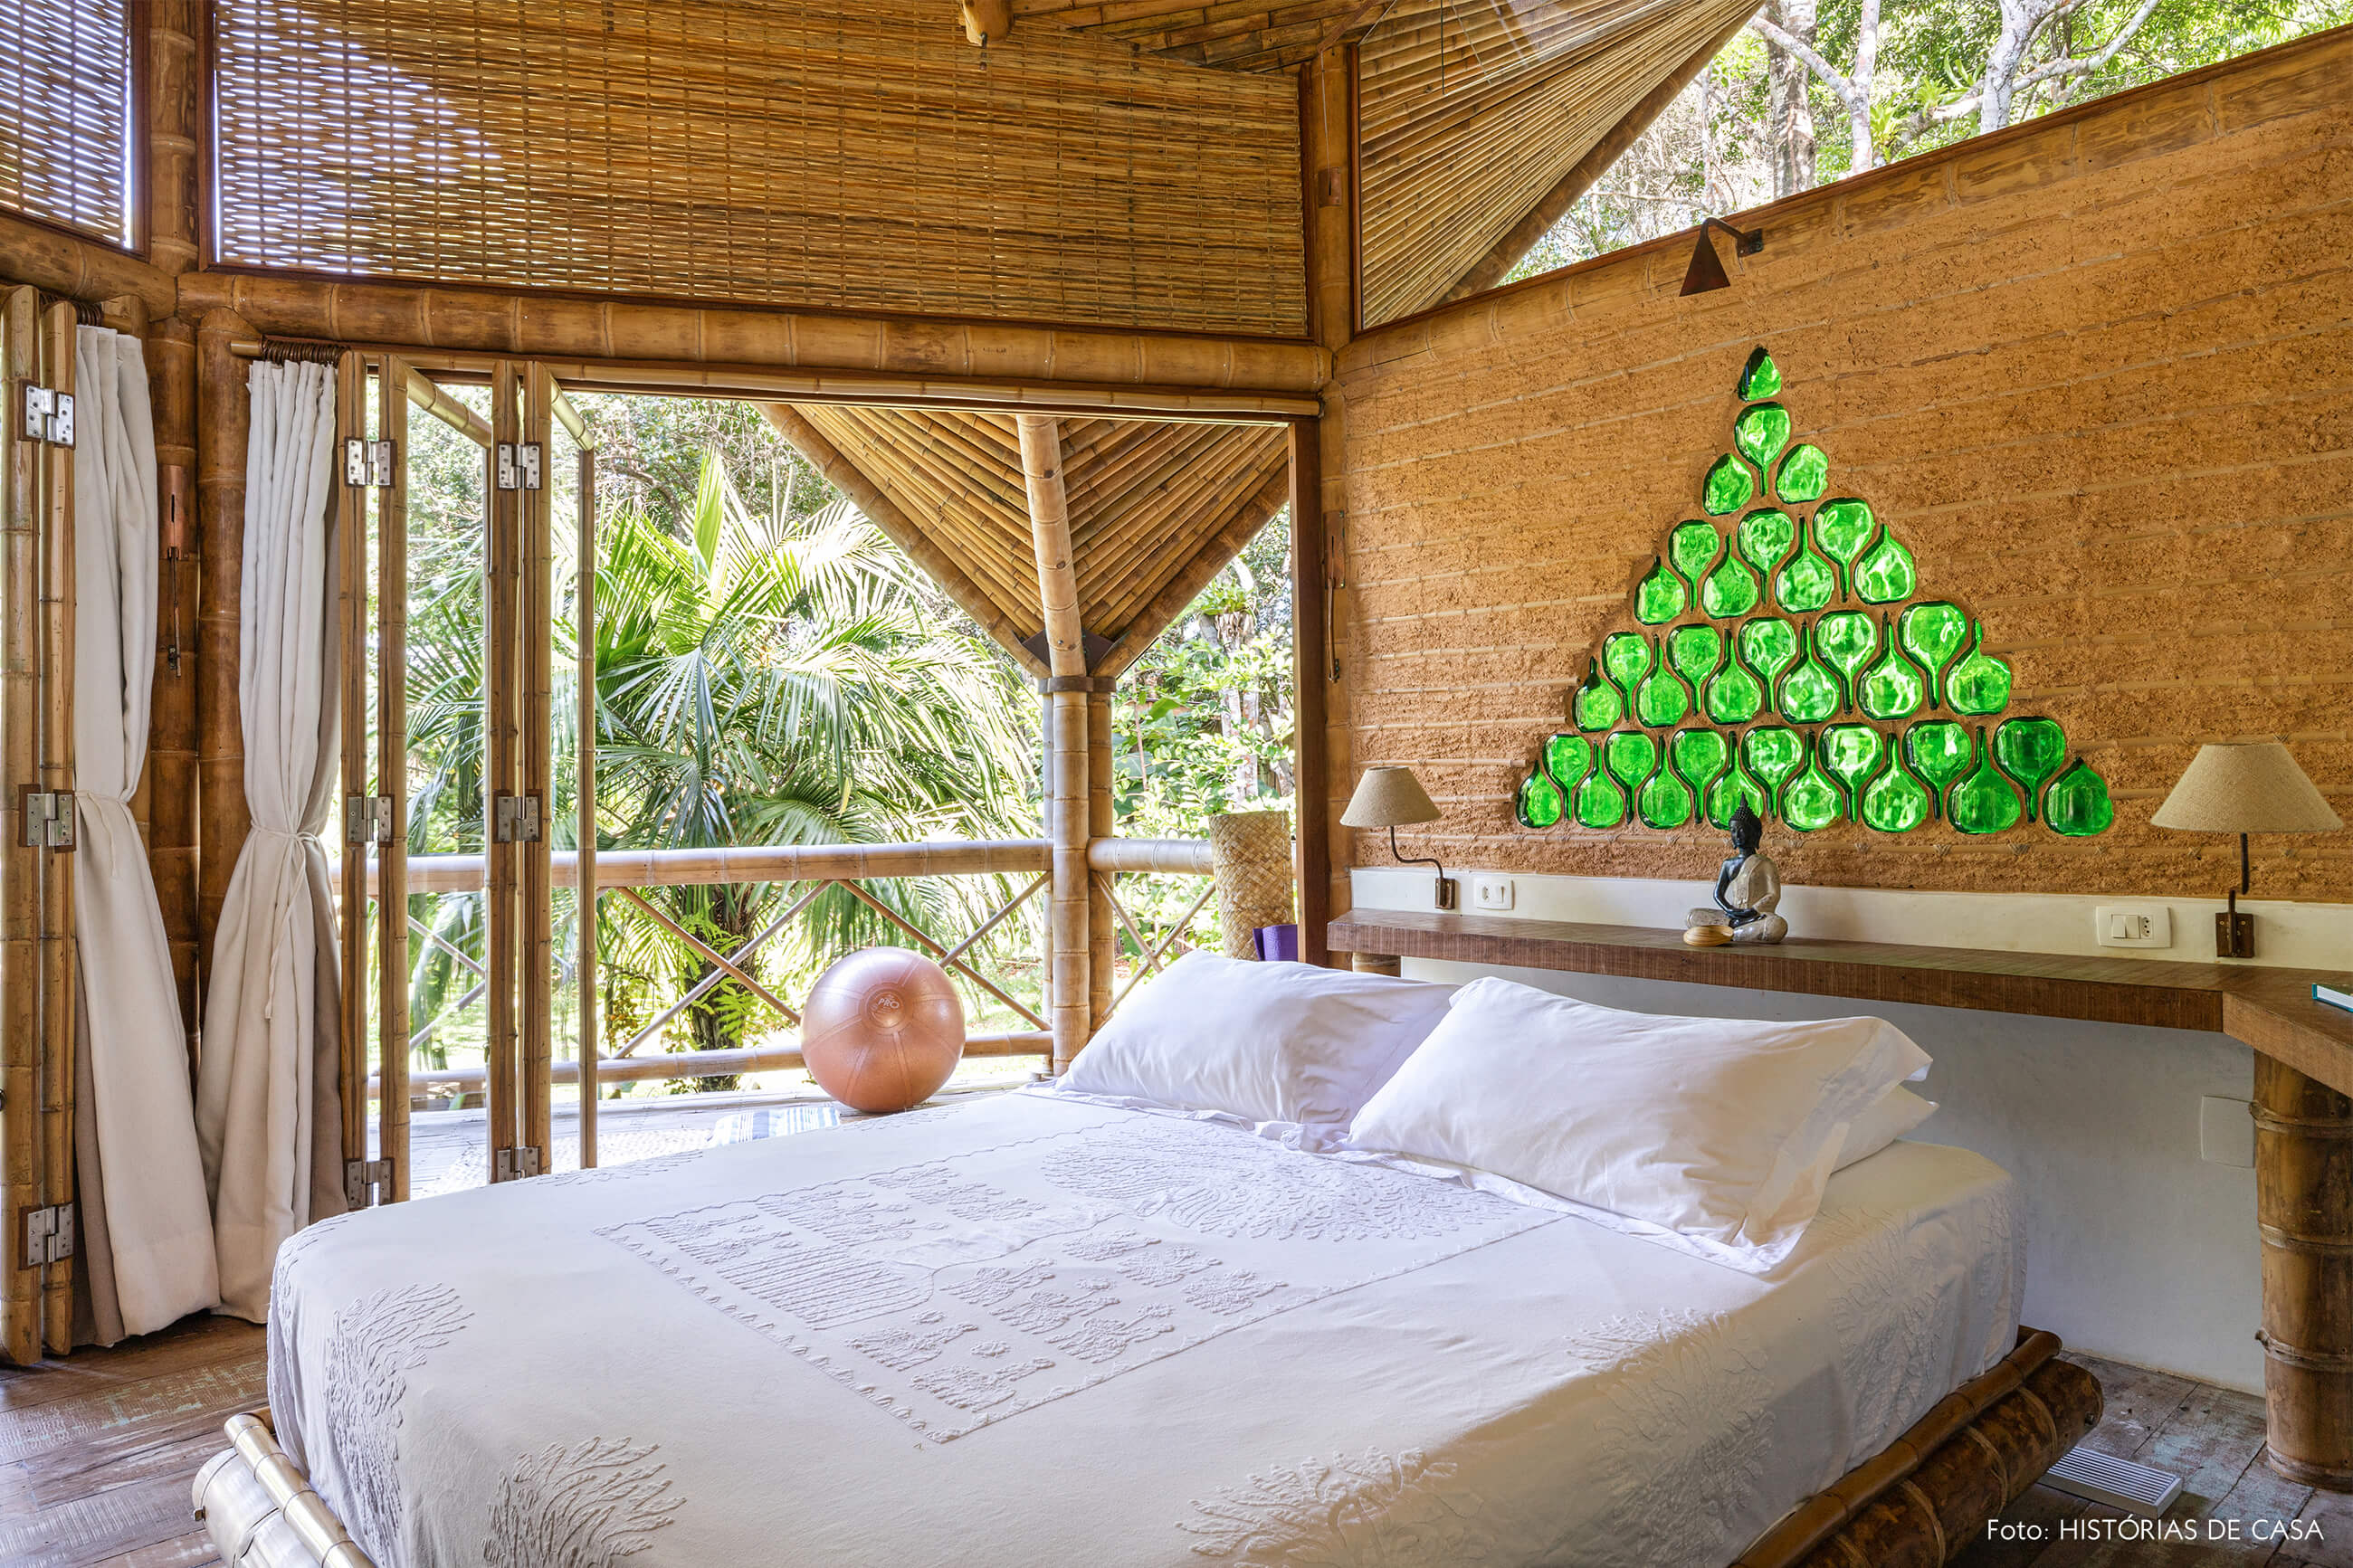 trancoso-vilasete-hotel-decoracao-59-quarto-branco-cama-bambu-detalhe-verde